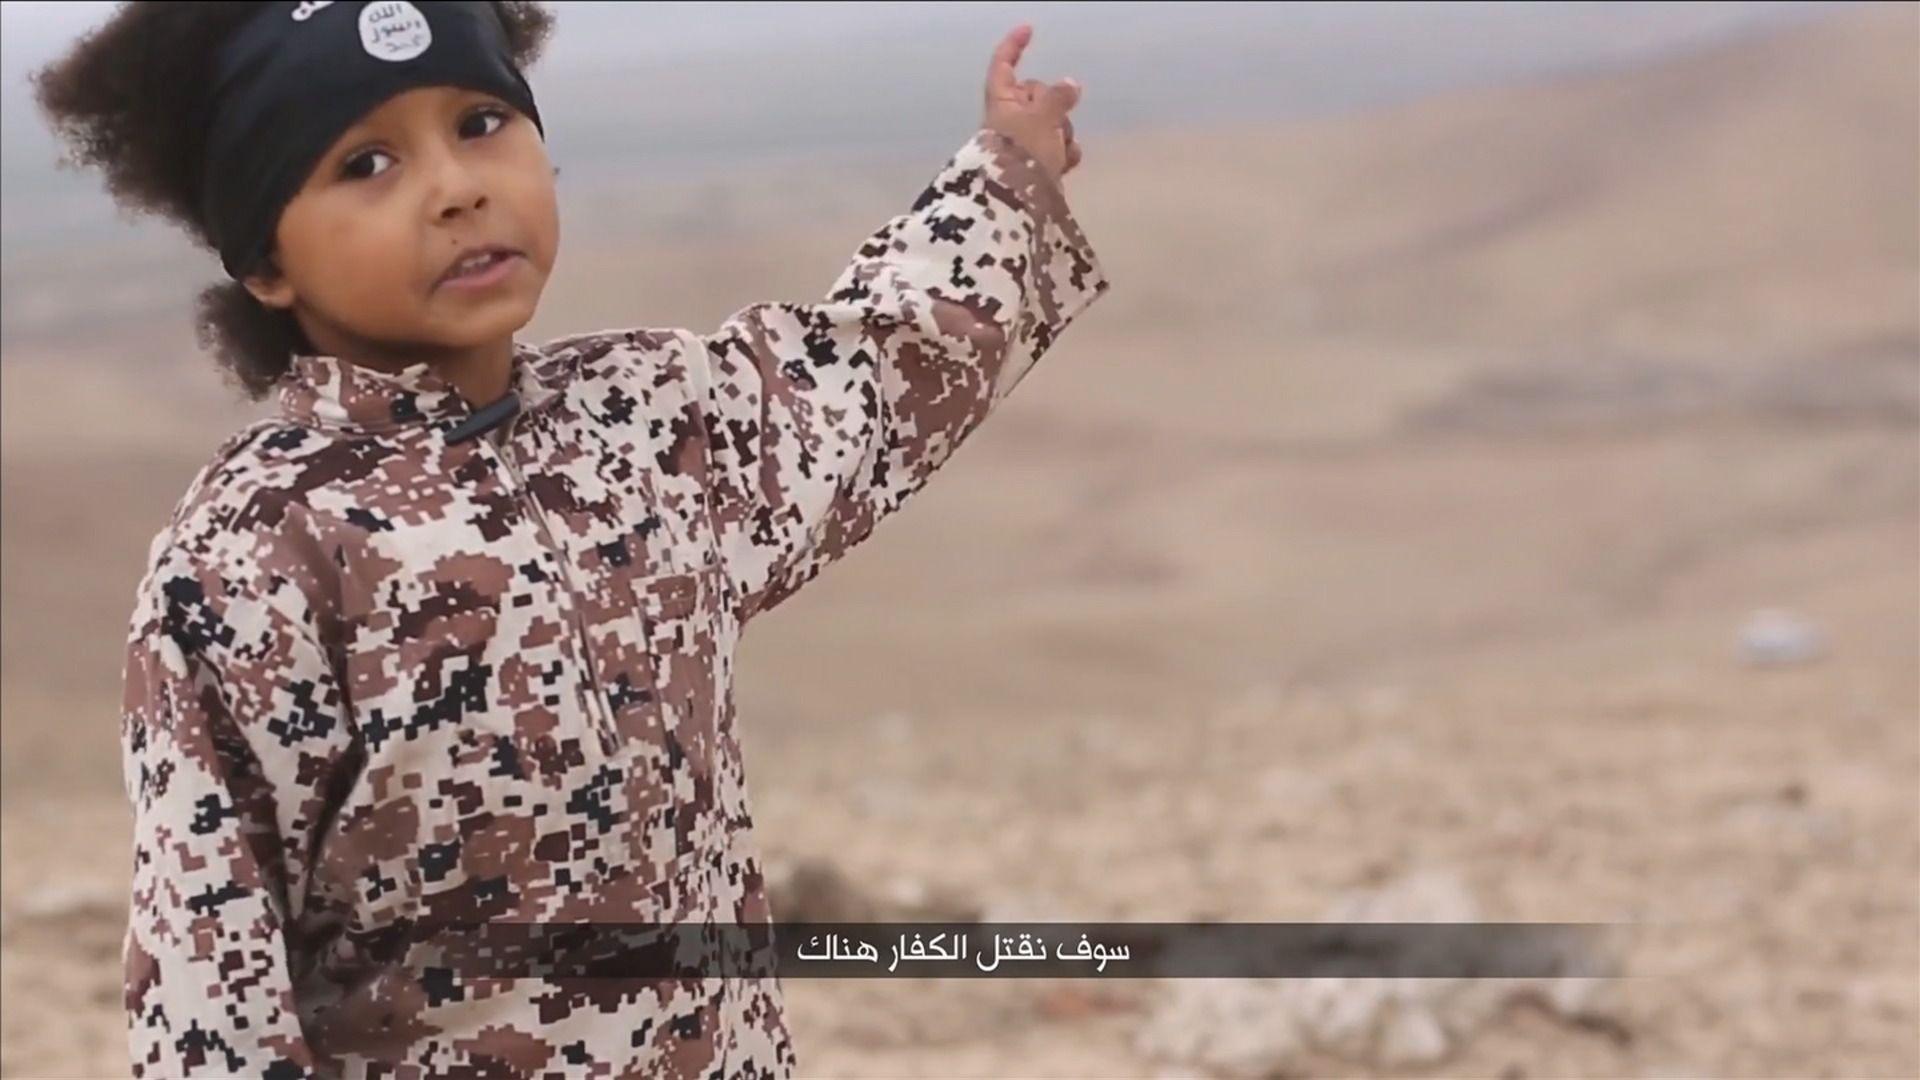 0106_JihadiJohn_ISIS_Syria_Iraq_01